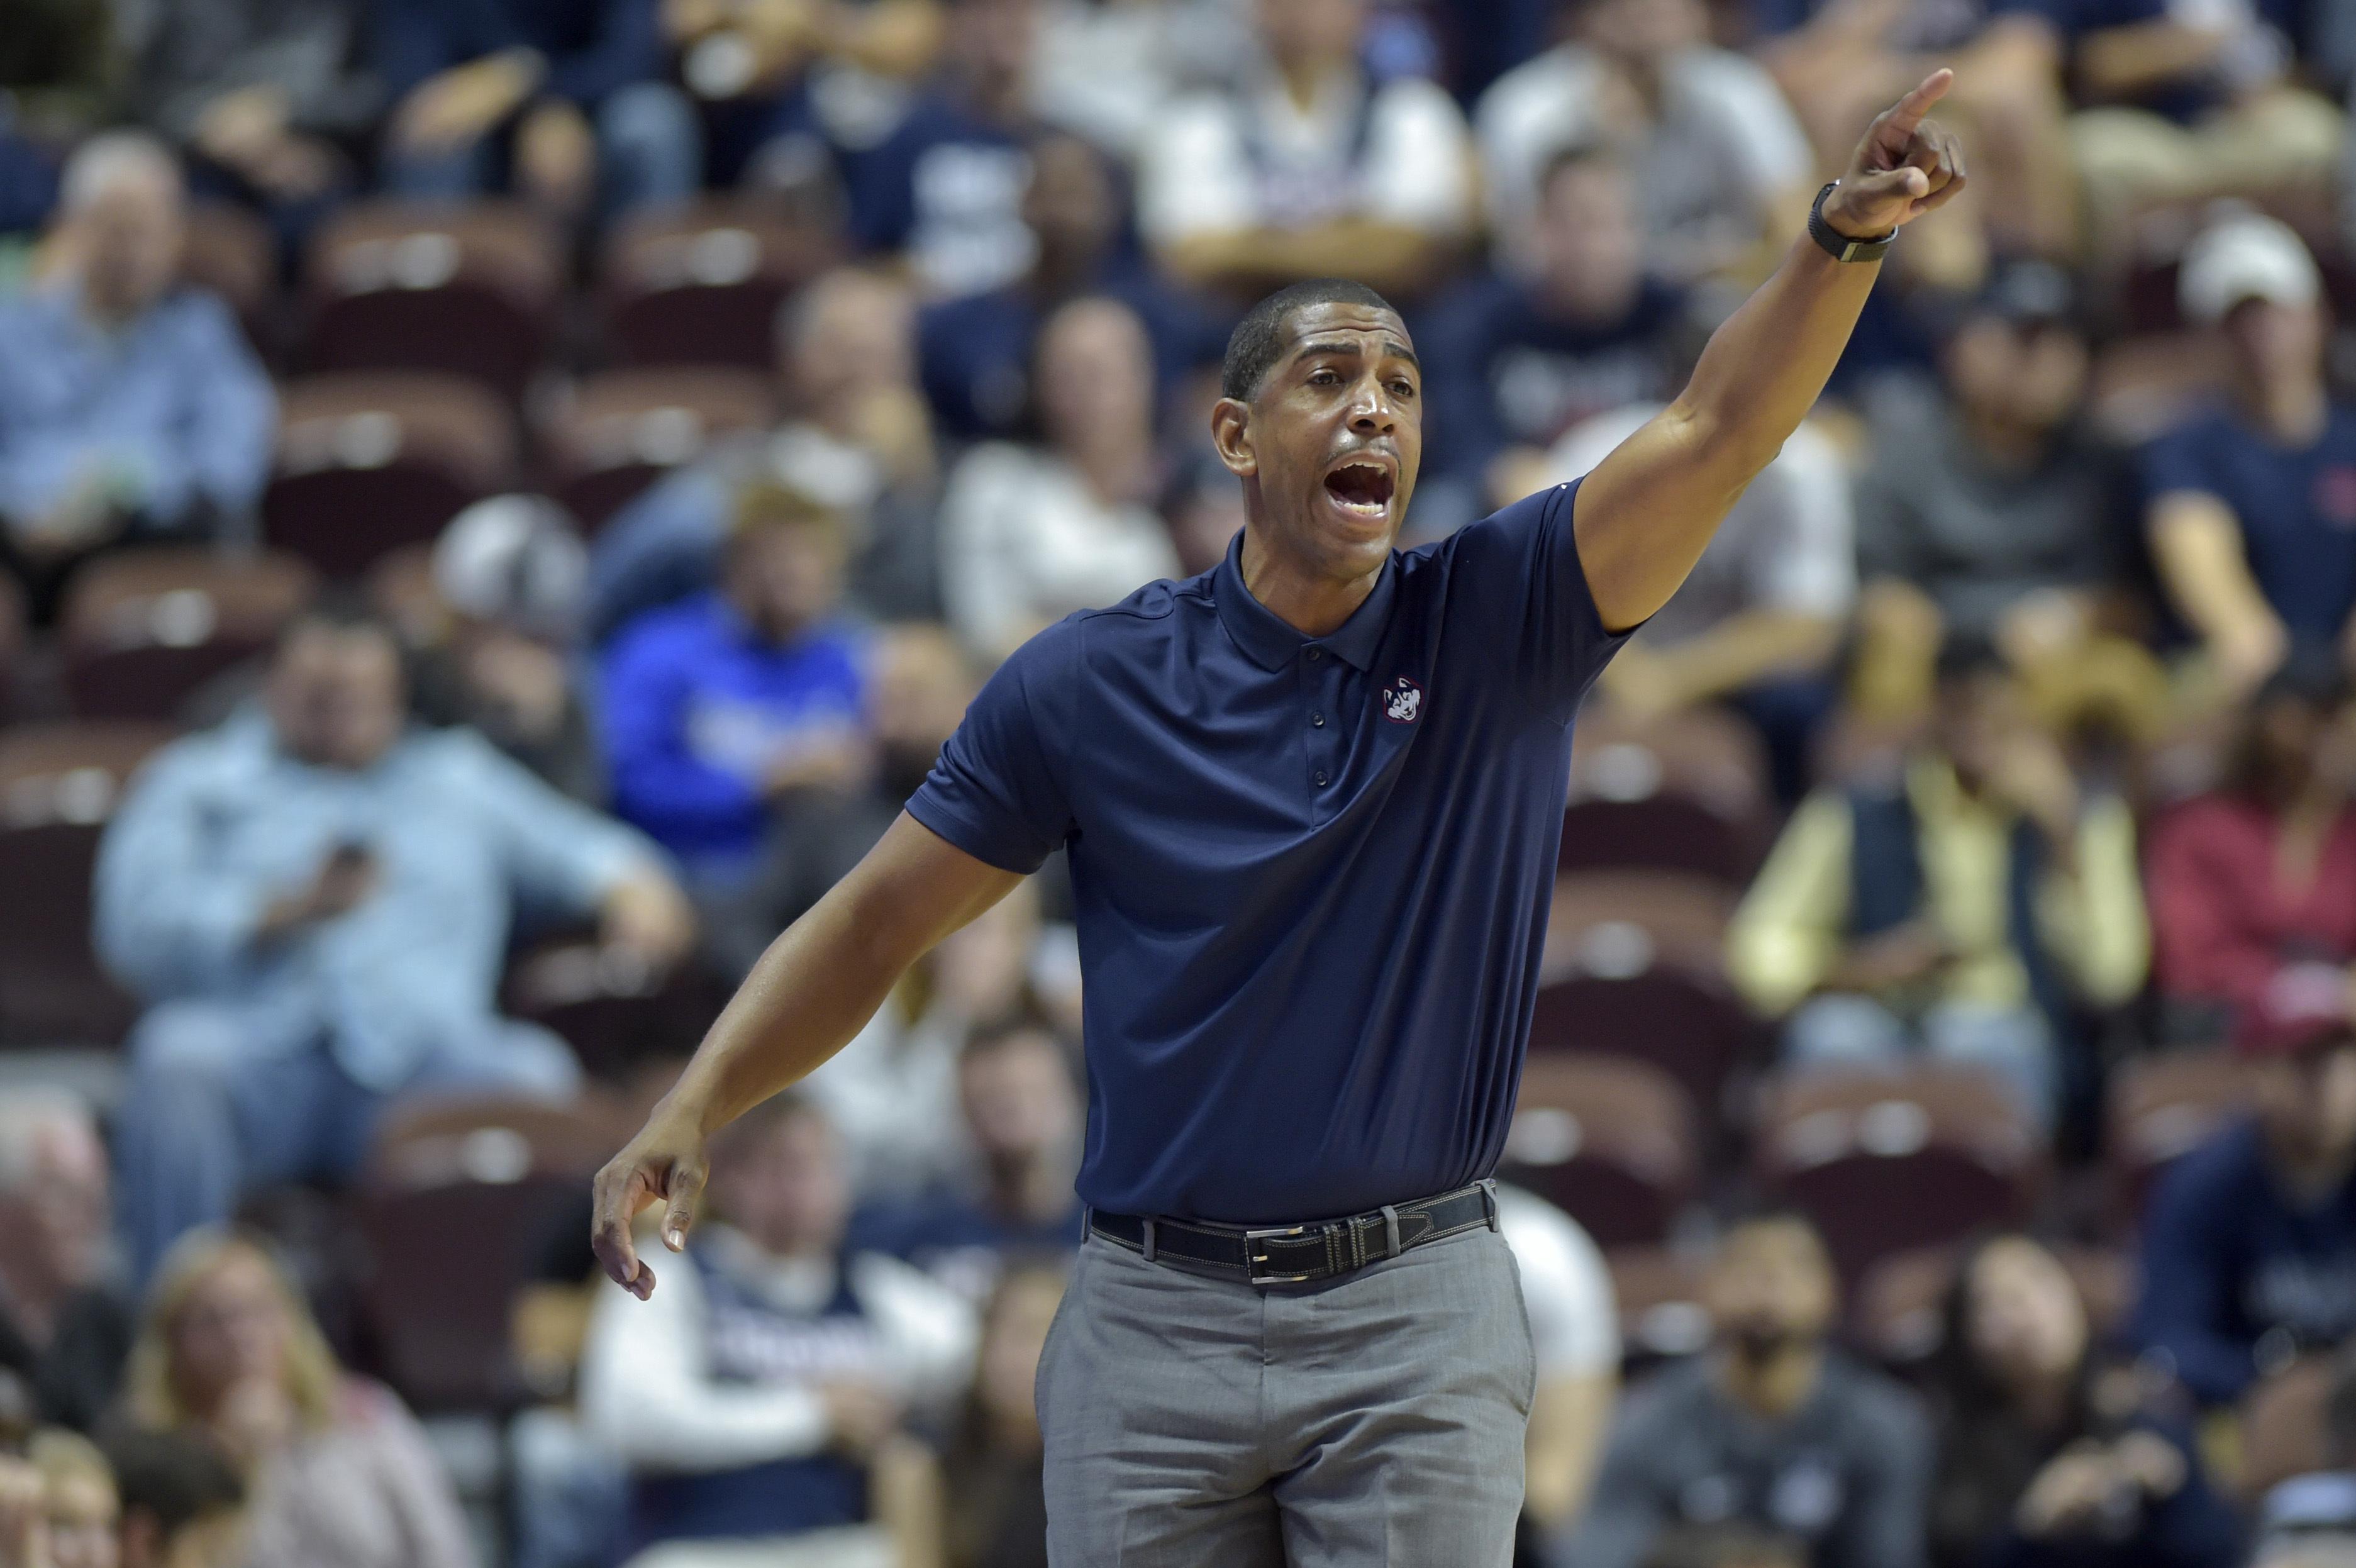 Connecticut head coach Kevin Ollie has fixed the program´s recent academic problems. (John Woike / Hartfor Courant